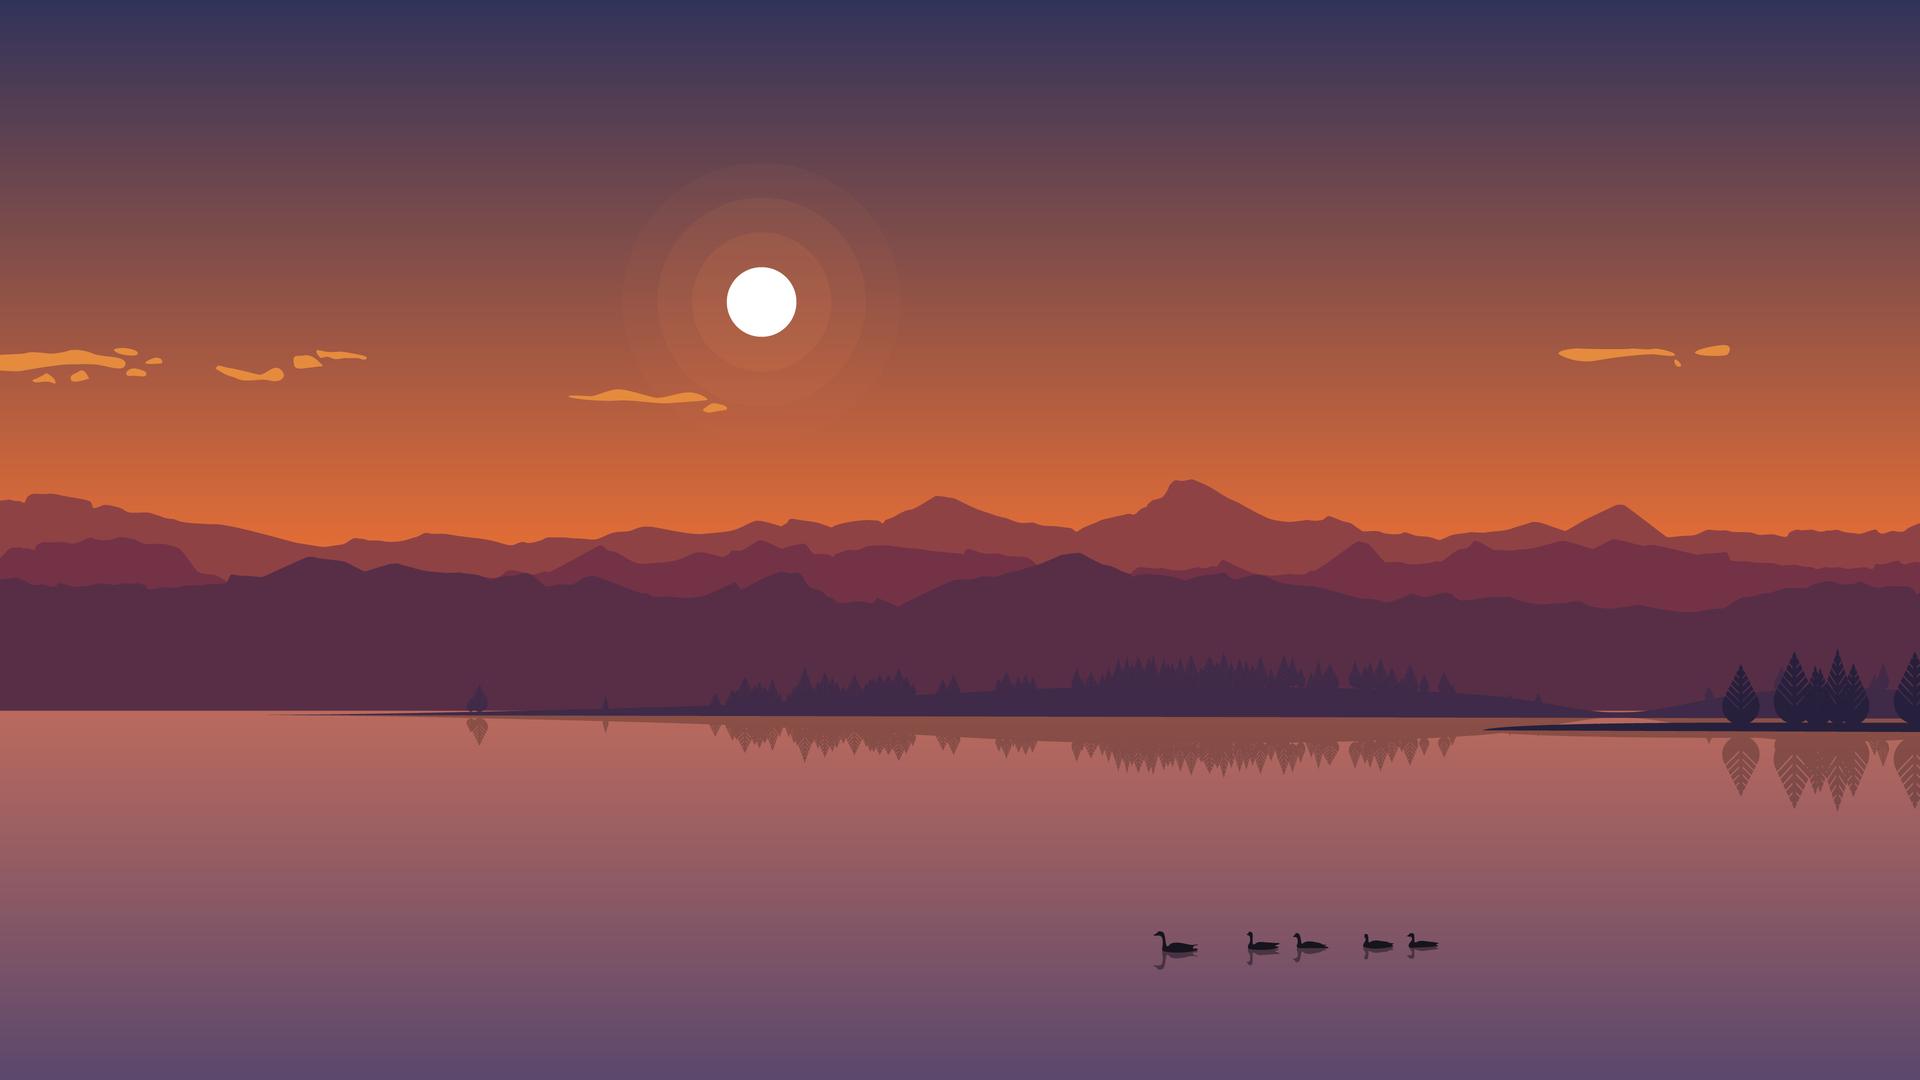 Sunset Wallpaper Hd 1920x1080: 1920x1080 Minimal Lake Sunset Laptop Full HD 1080P HD 4k